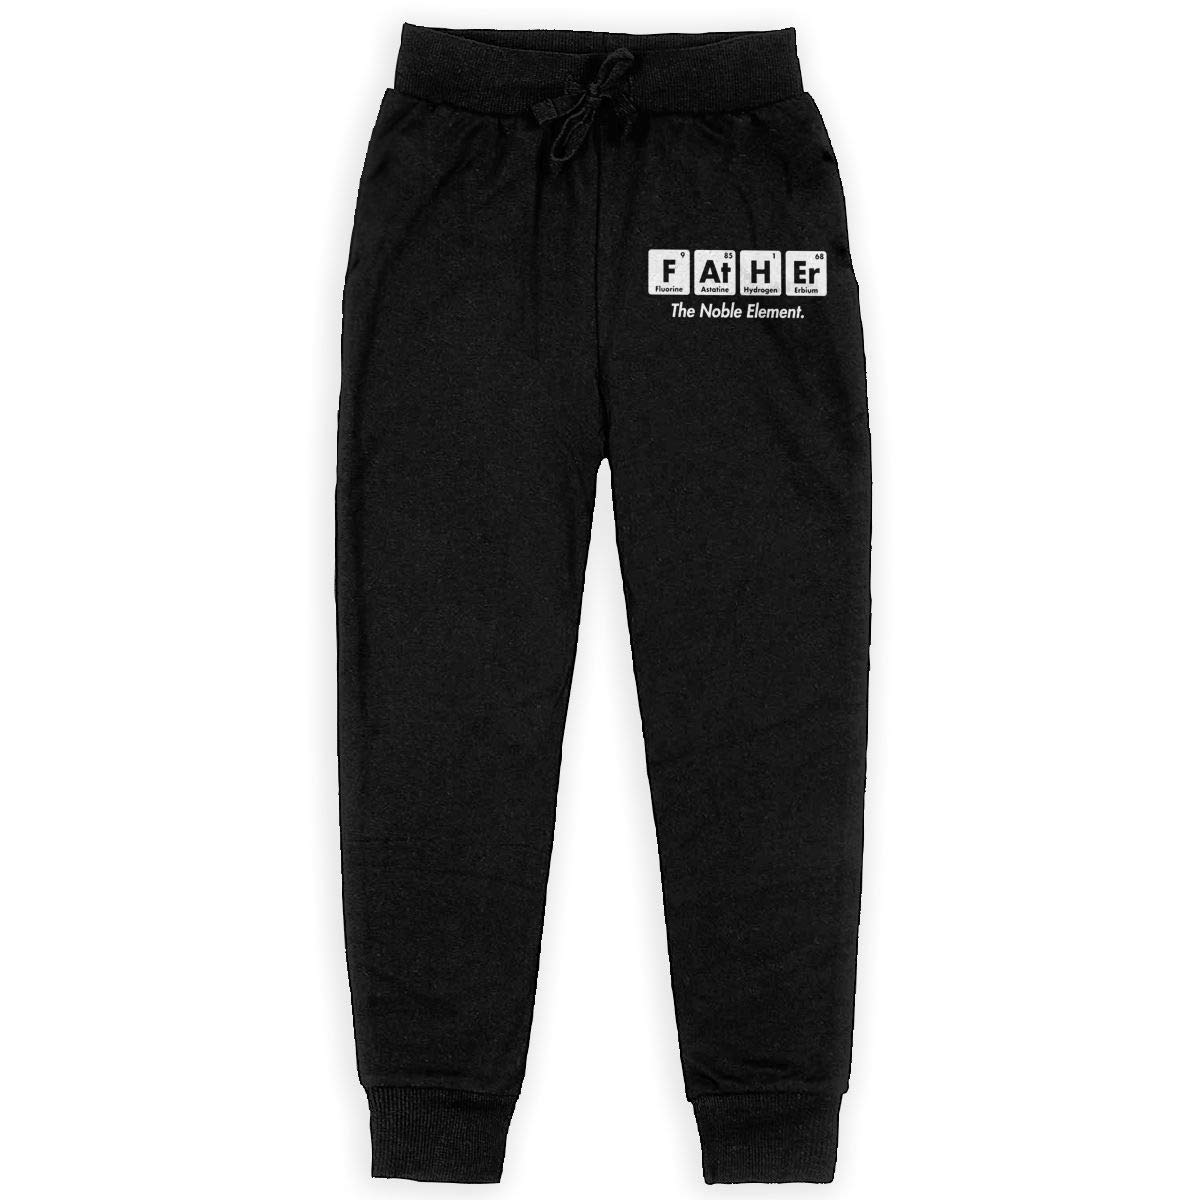 Kim Mittelstaedt Father Element Boys Big Active Basic Casual Pants Sweatpants for Boys Black